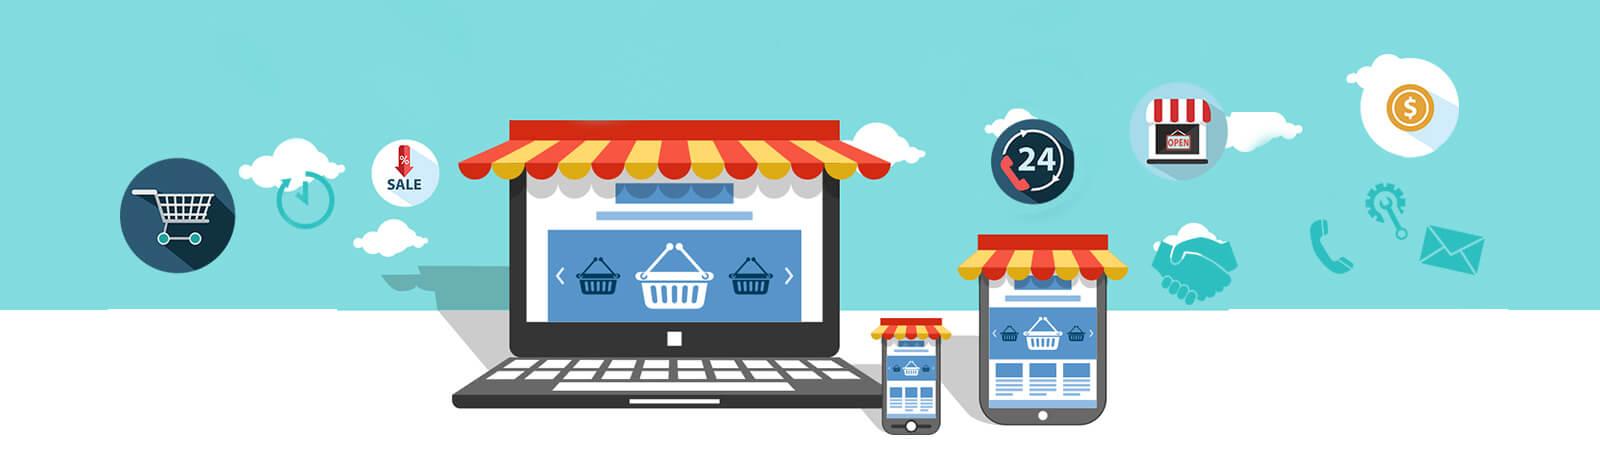 e-commerce-website-development-services